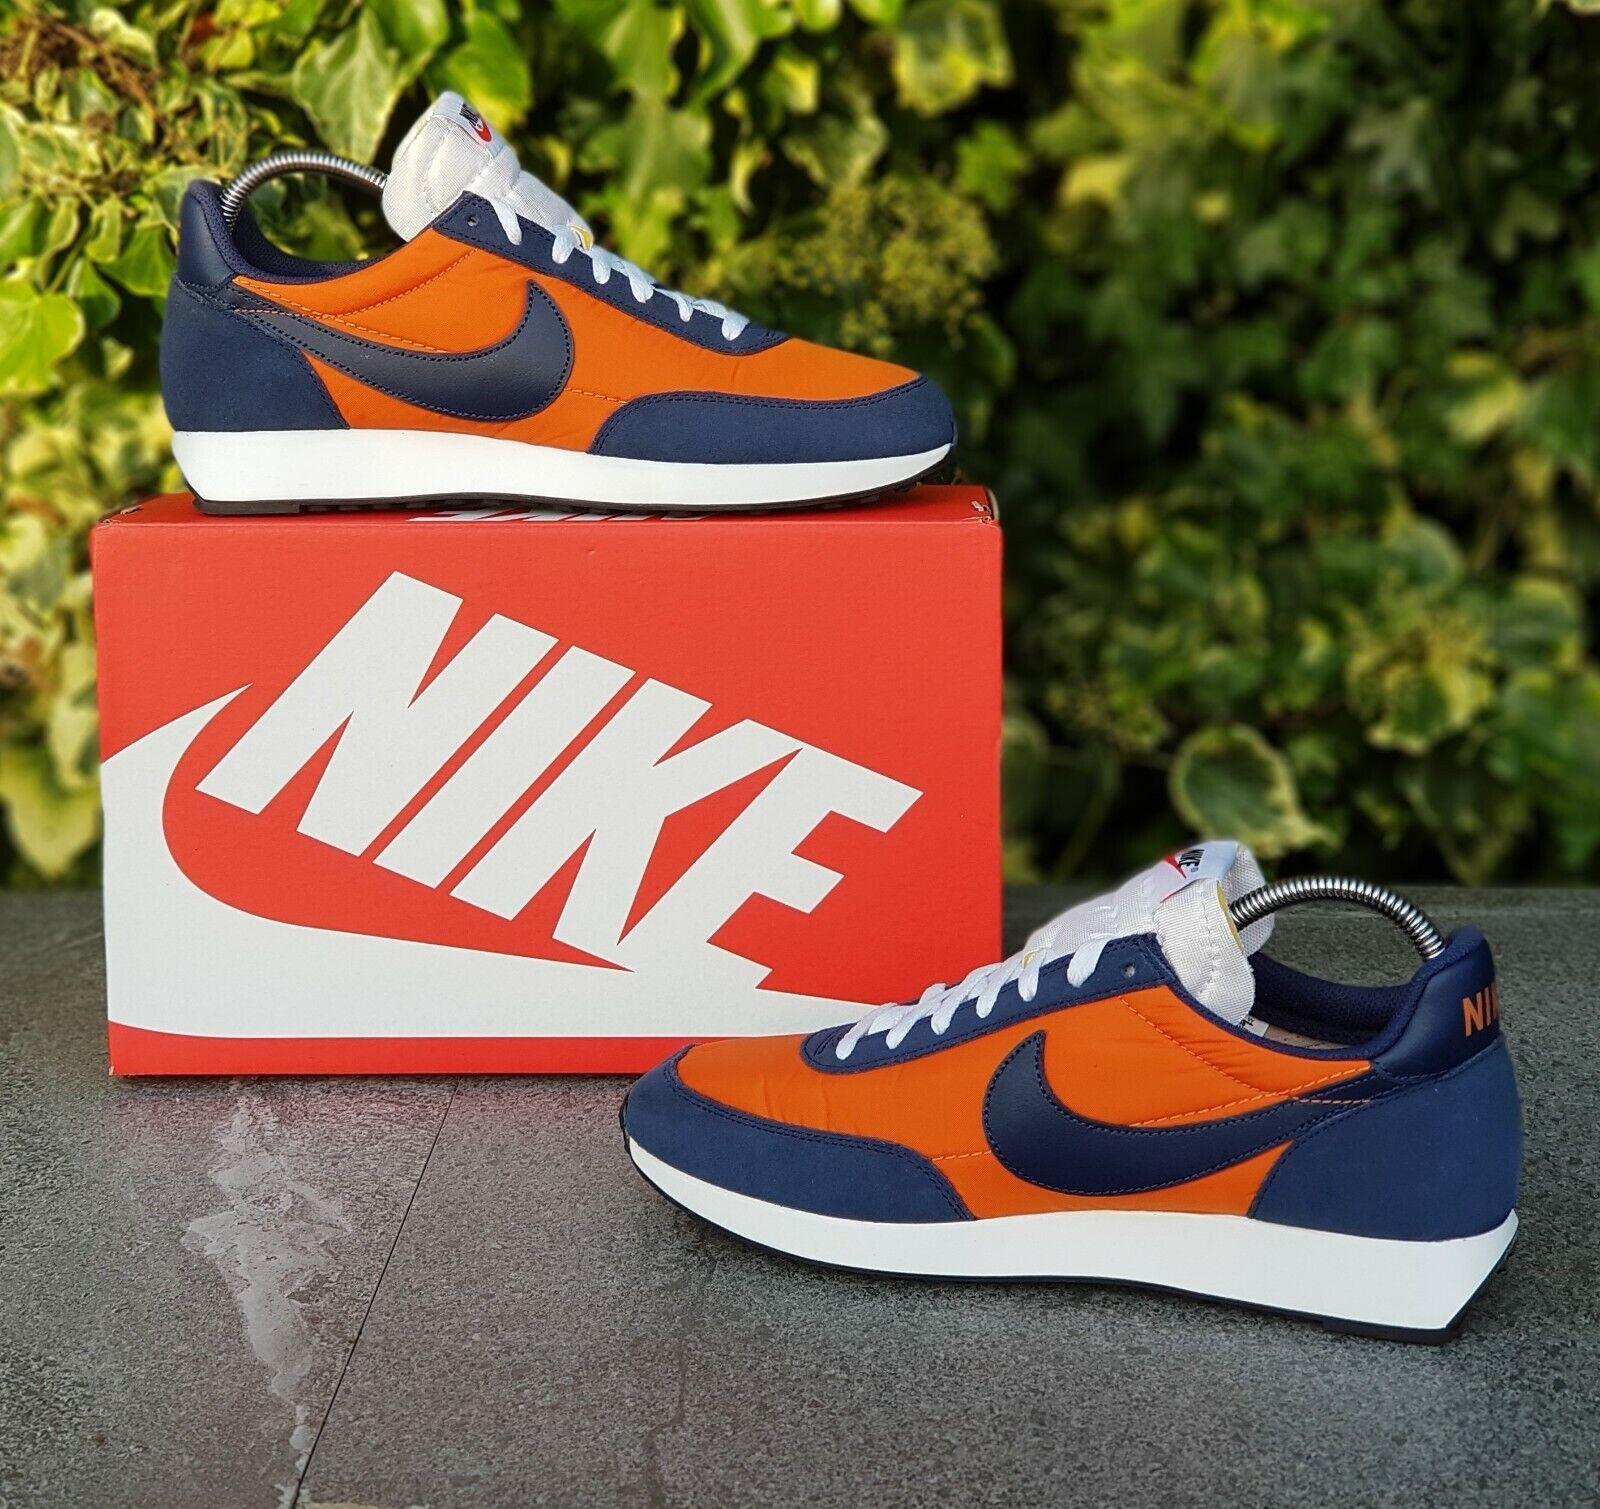 BNWB & Genuine Nike ® Air Tailwind 79 Retro Orange & Blau Trainers UK Größe 8